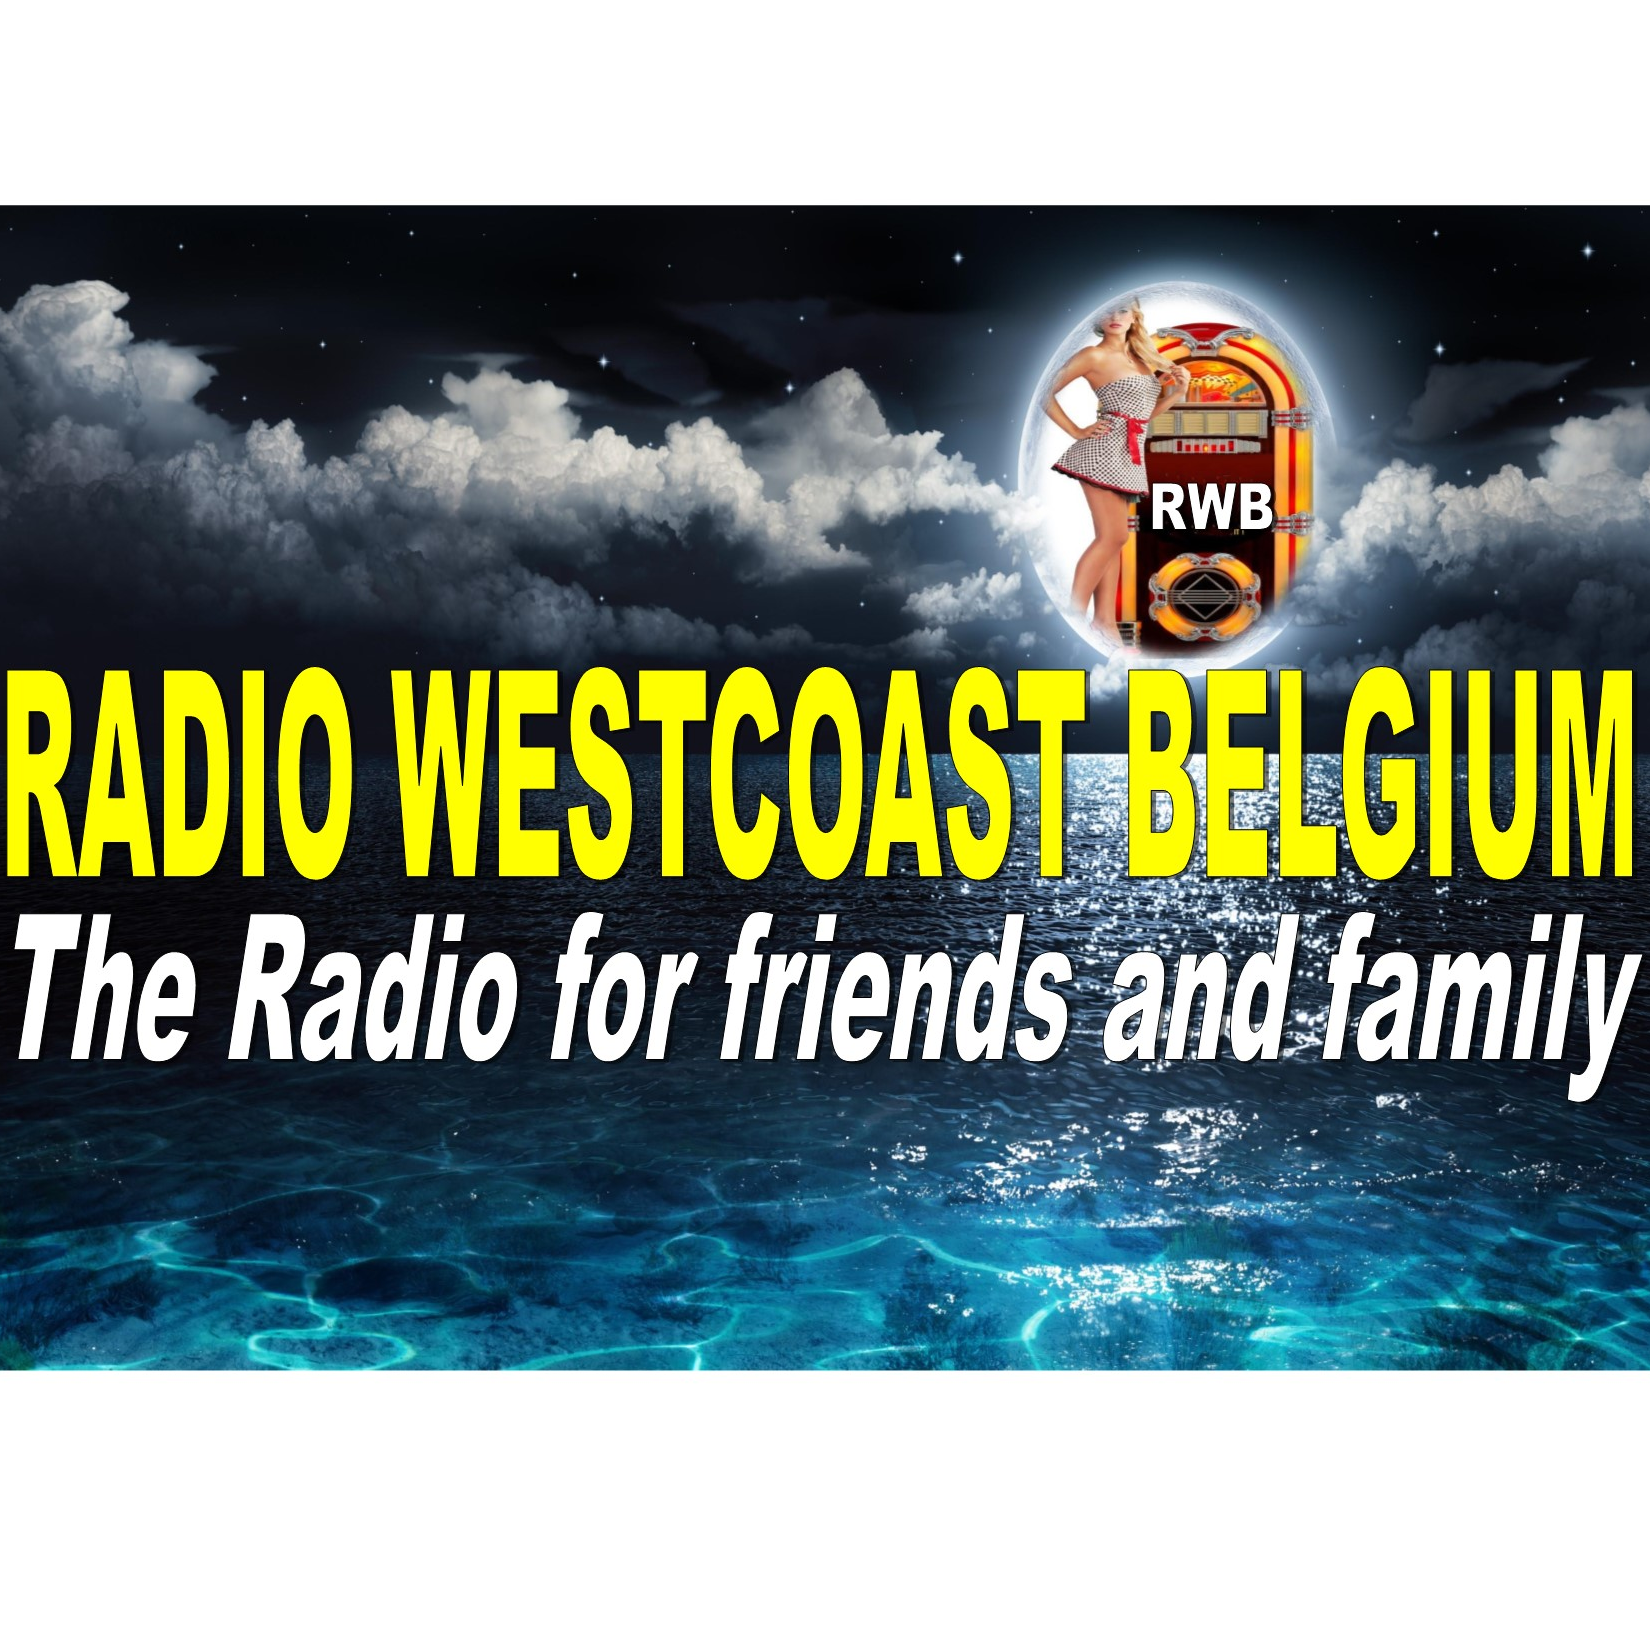 Radio Westcoast Belgium - RWB